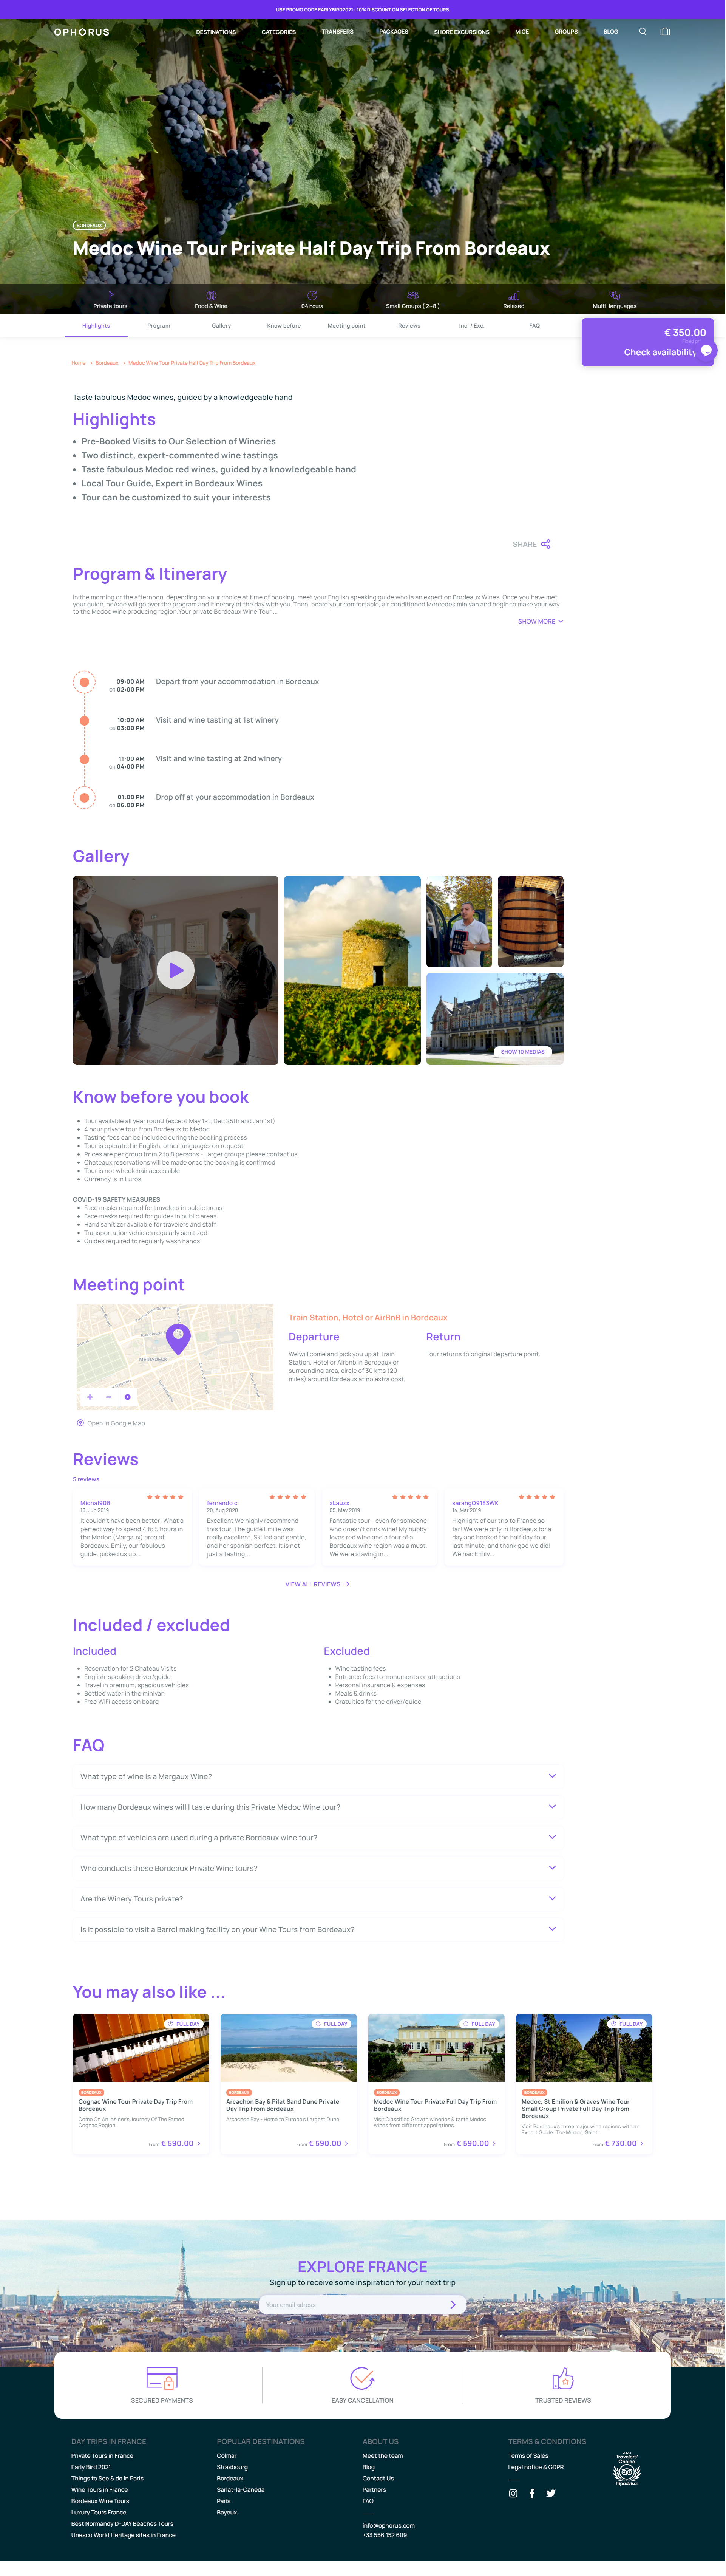 page produit, conception site web kalfeutre lyon